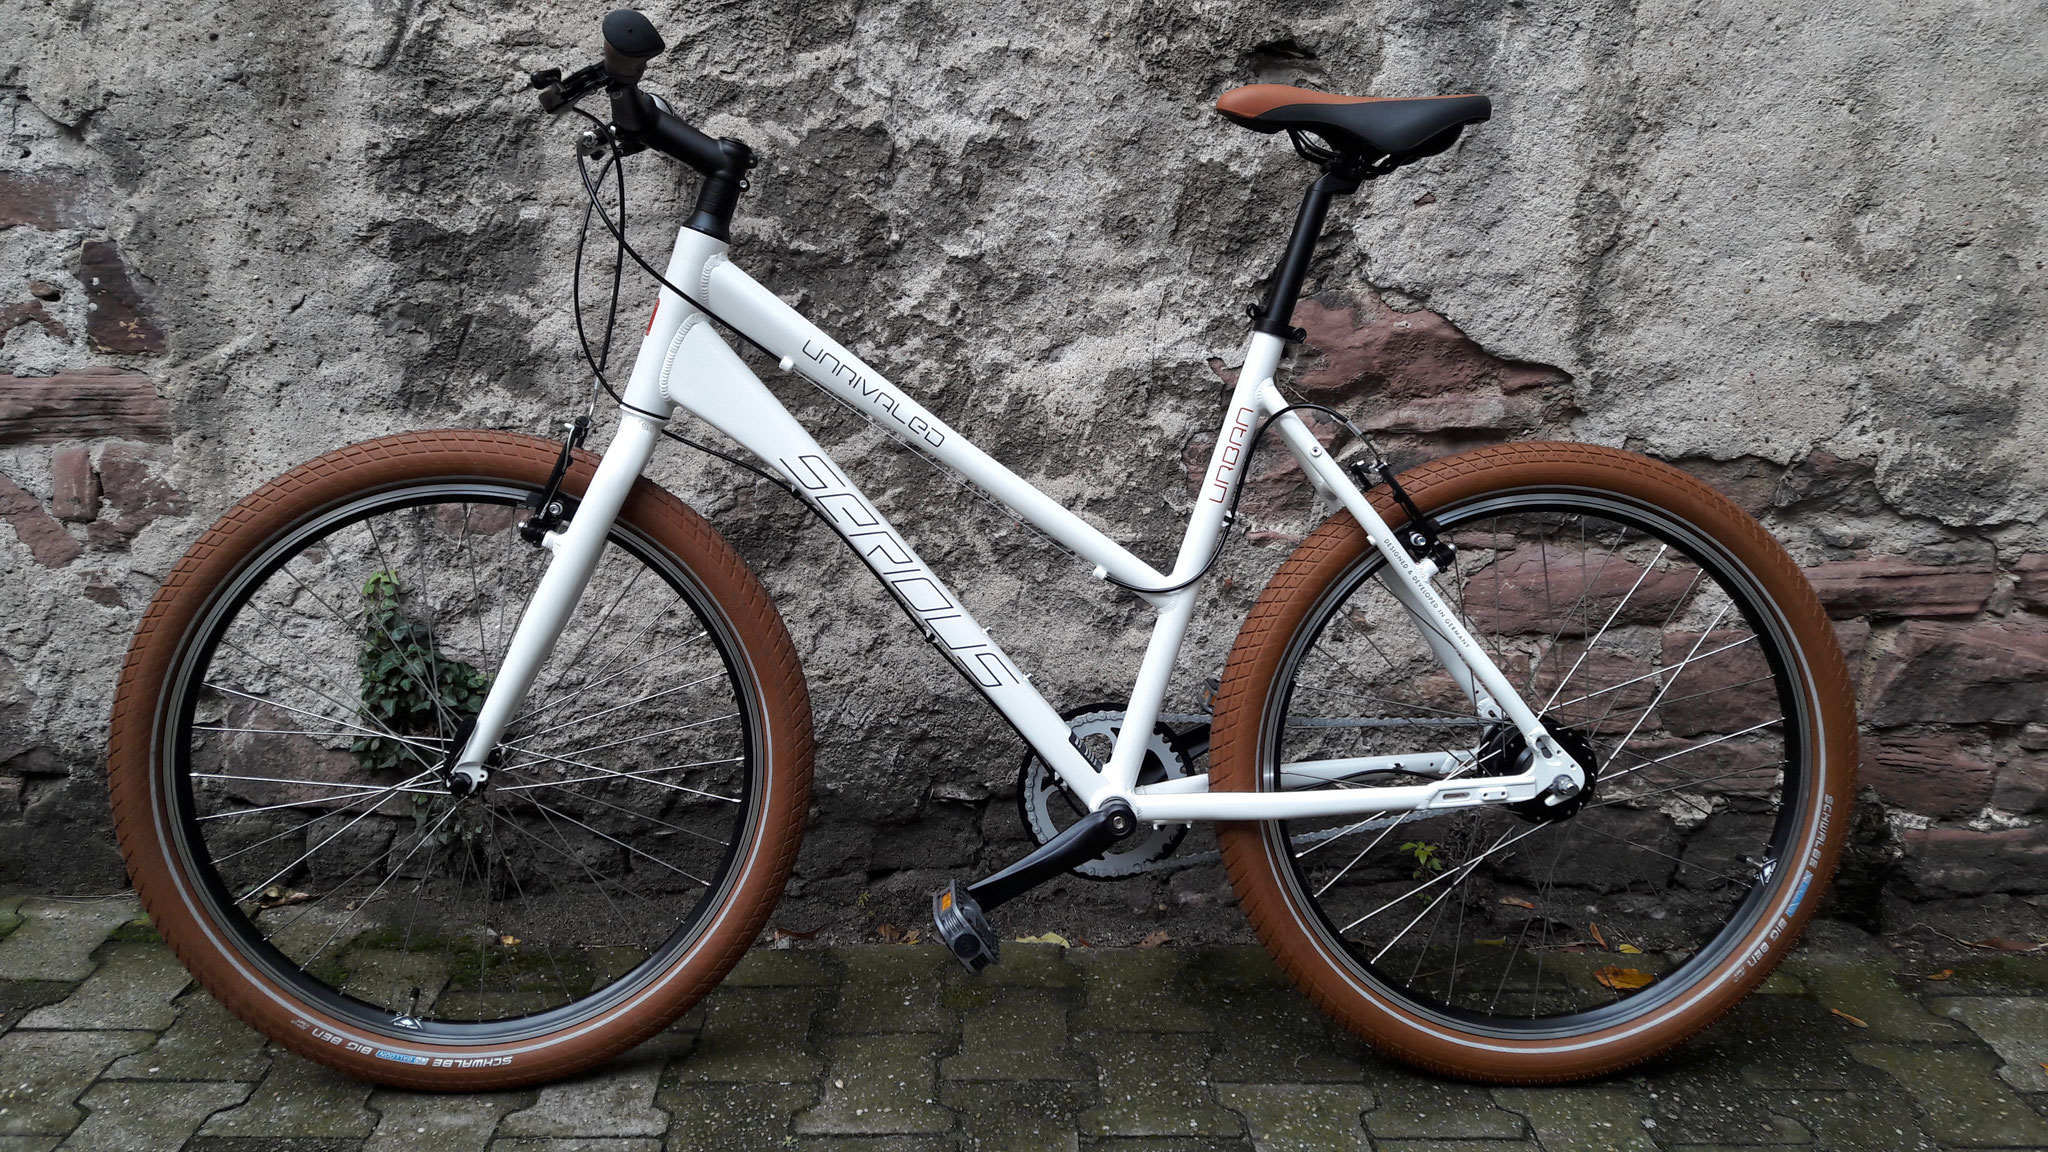 Fahrradvermietung Karlsruhe Indiroad67